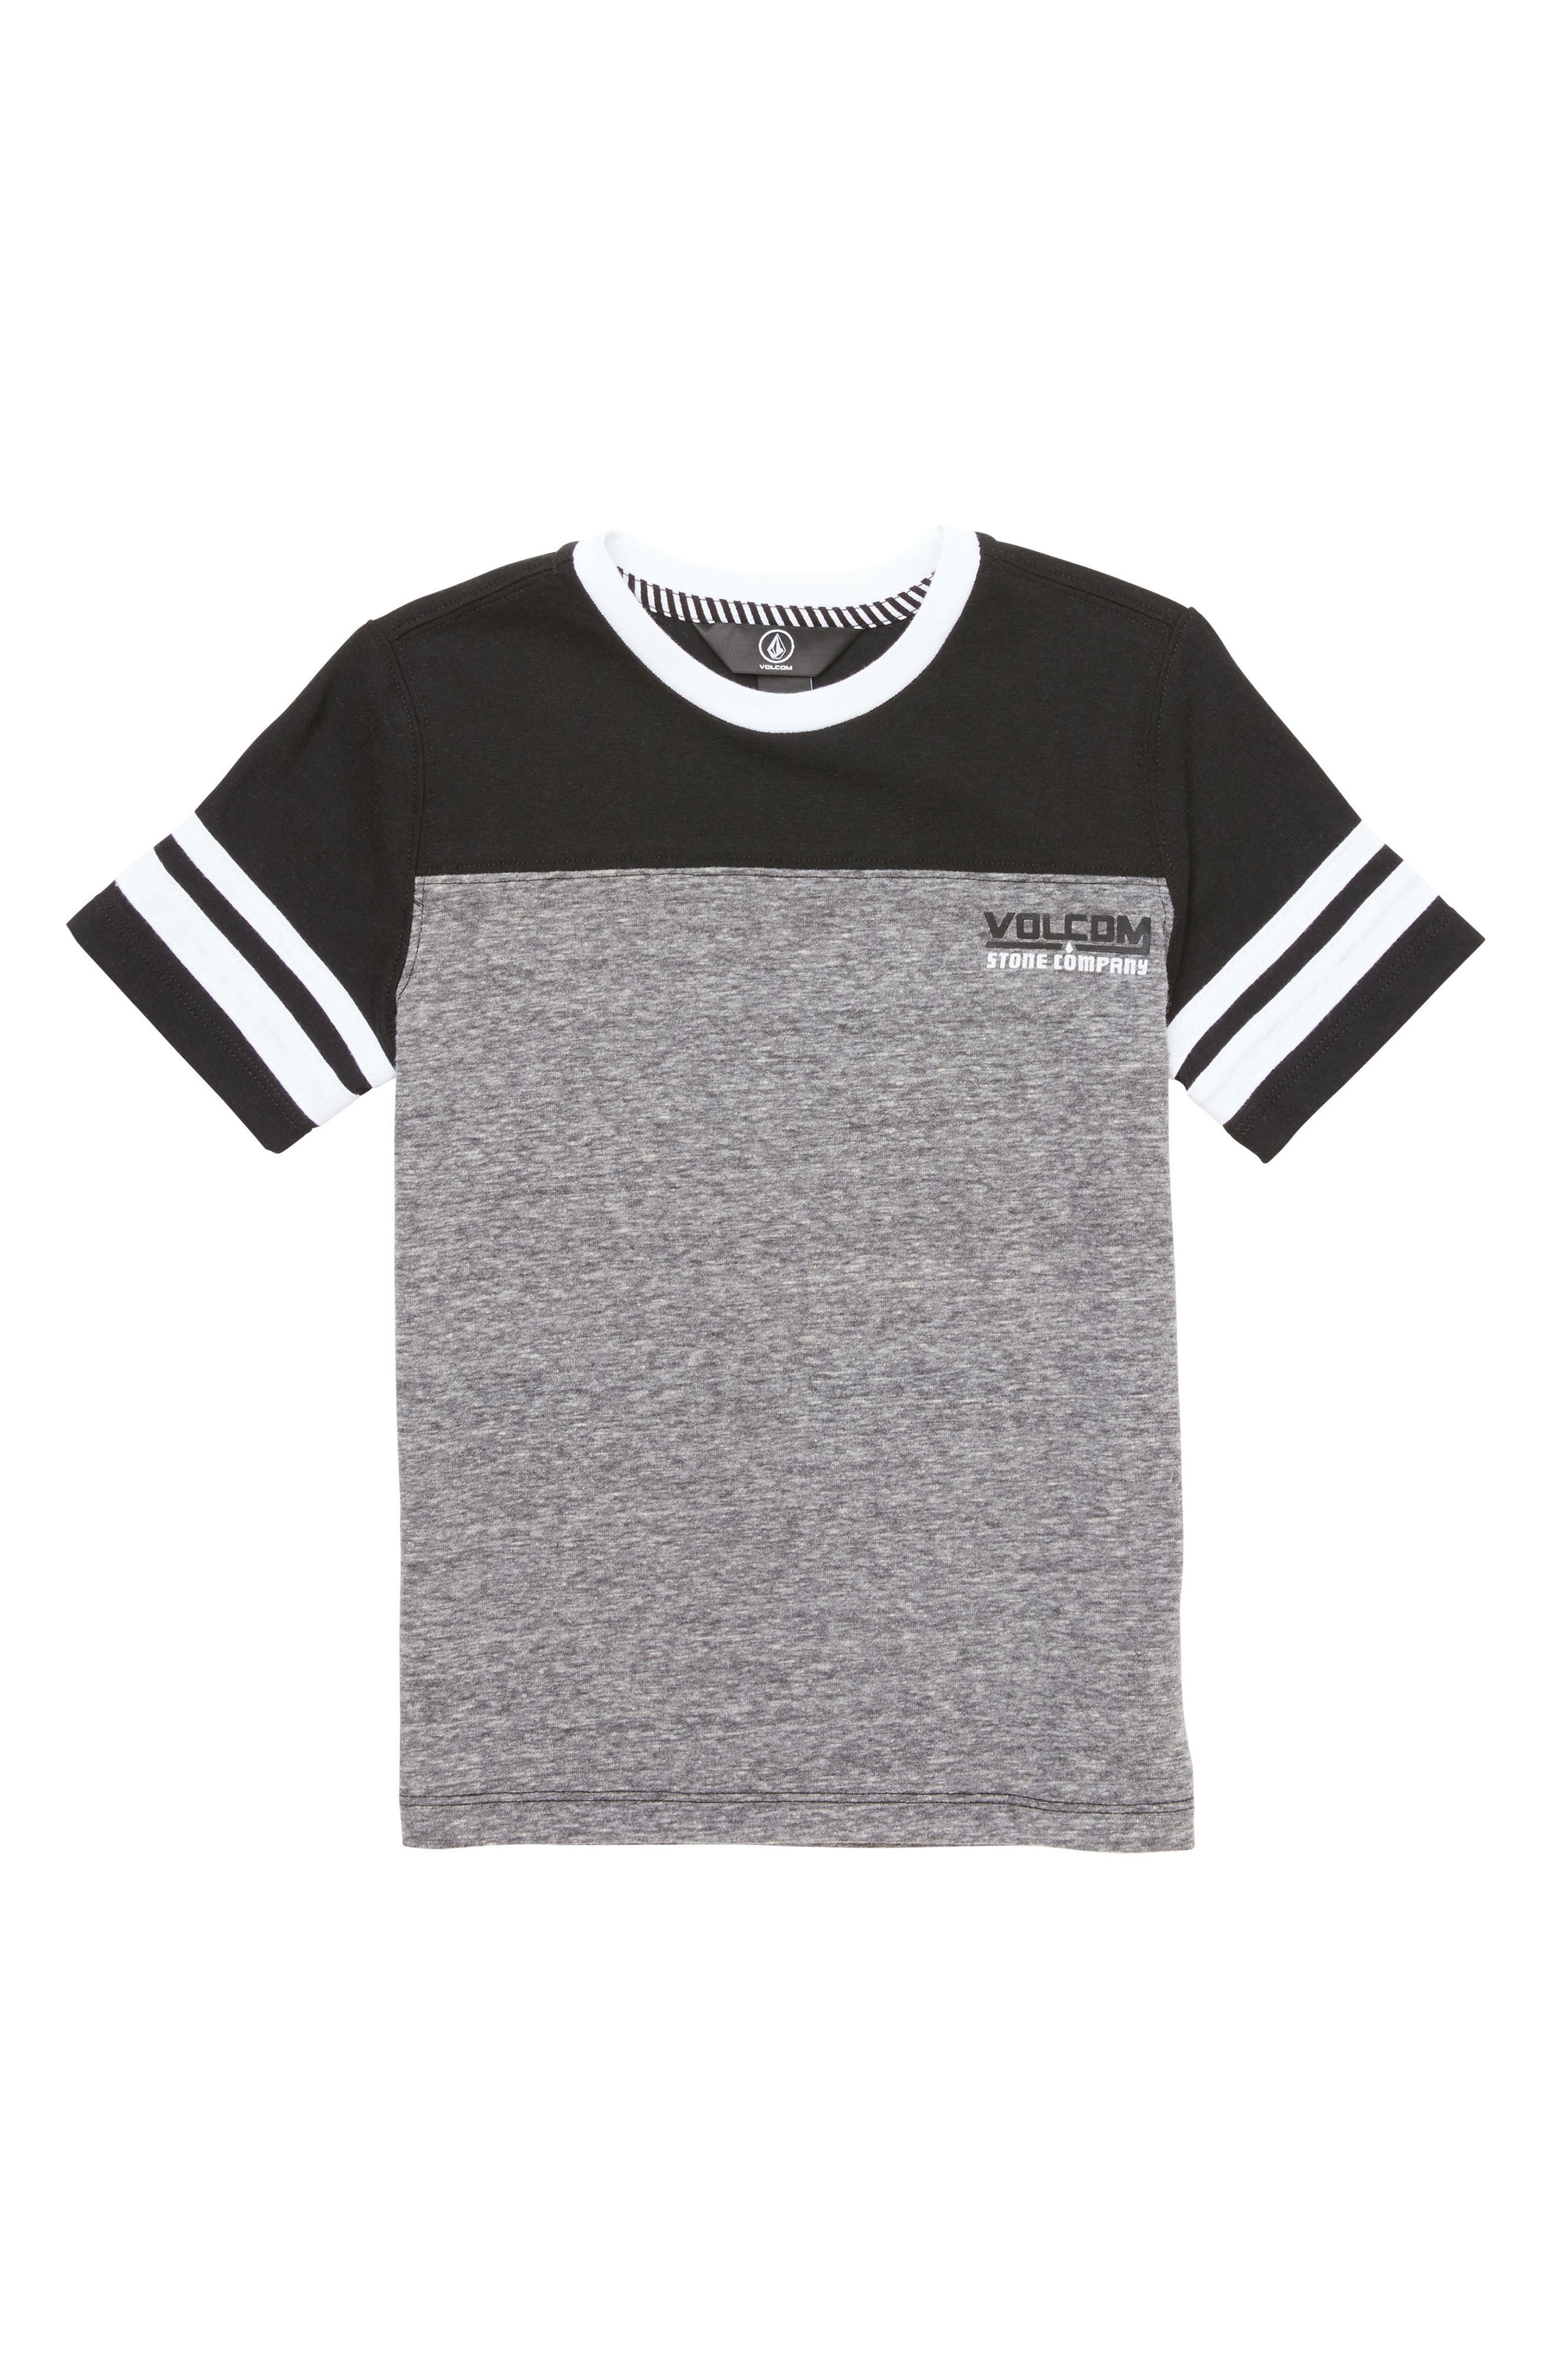 Volcom Walden Shirt (Toddler Boys & Little Boys)